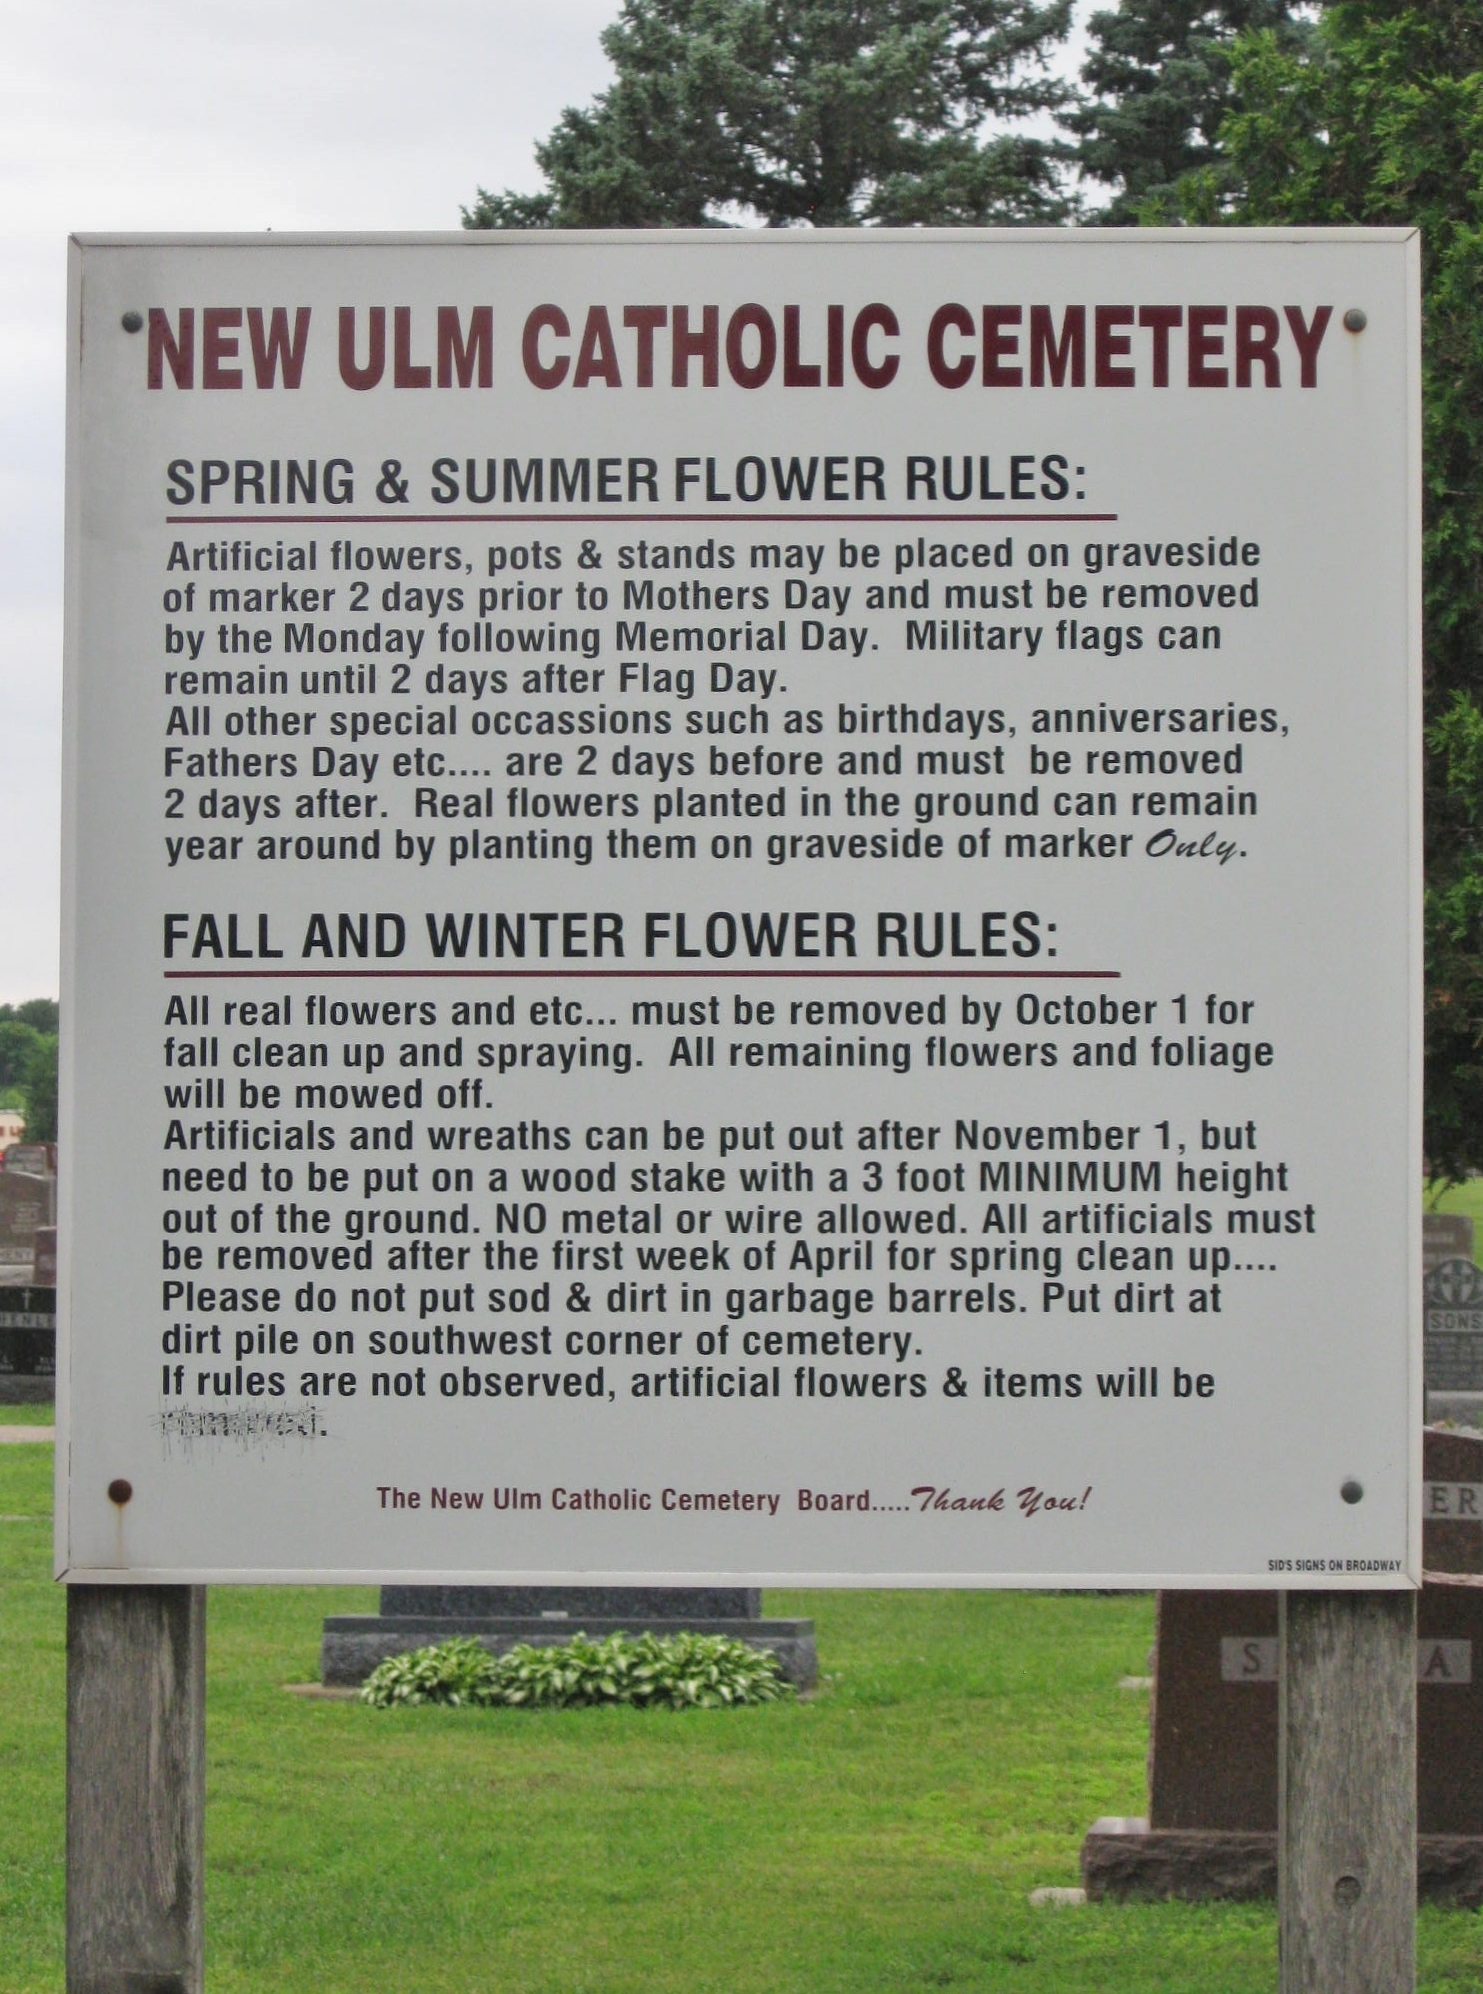 New Ulm Catholic Cemetery